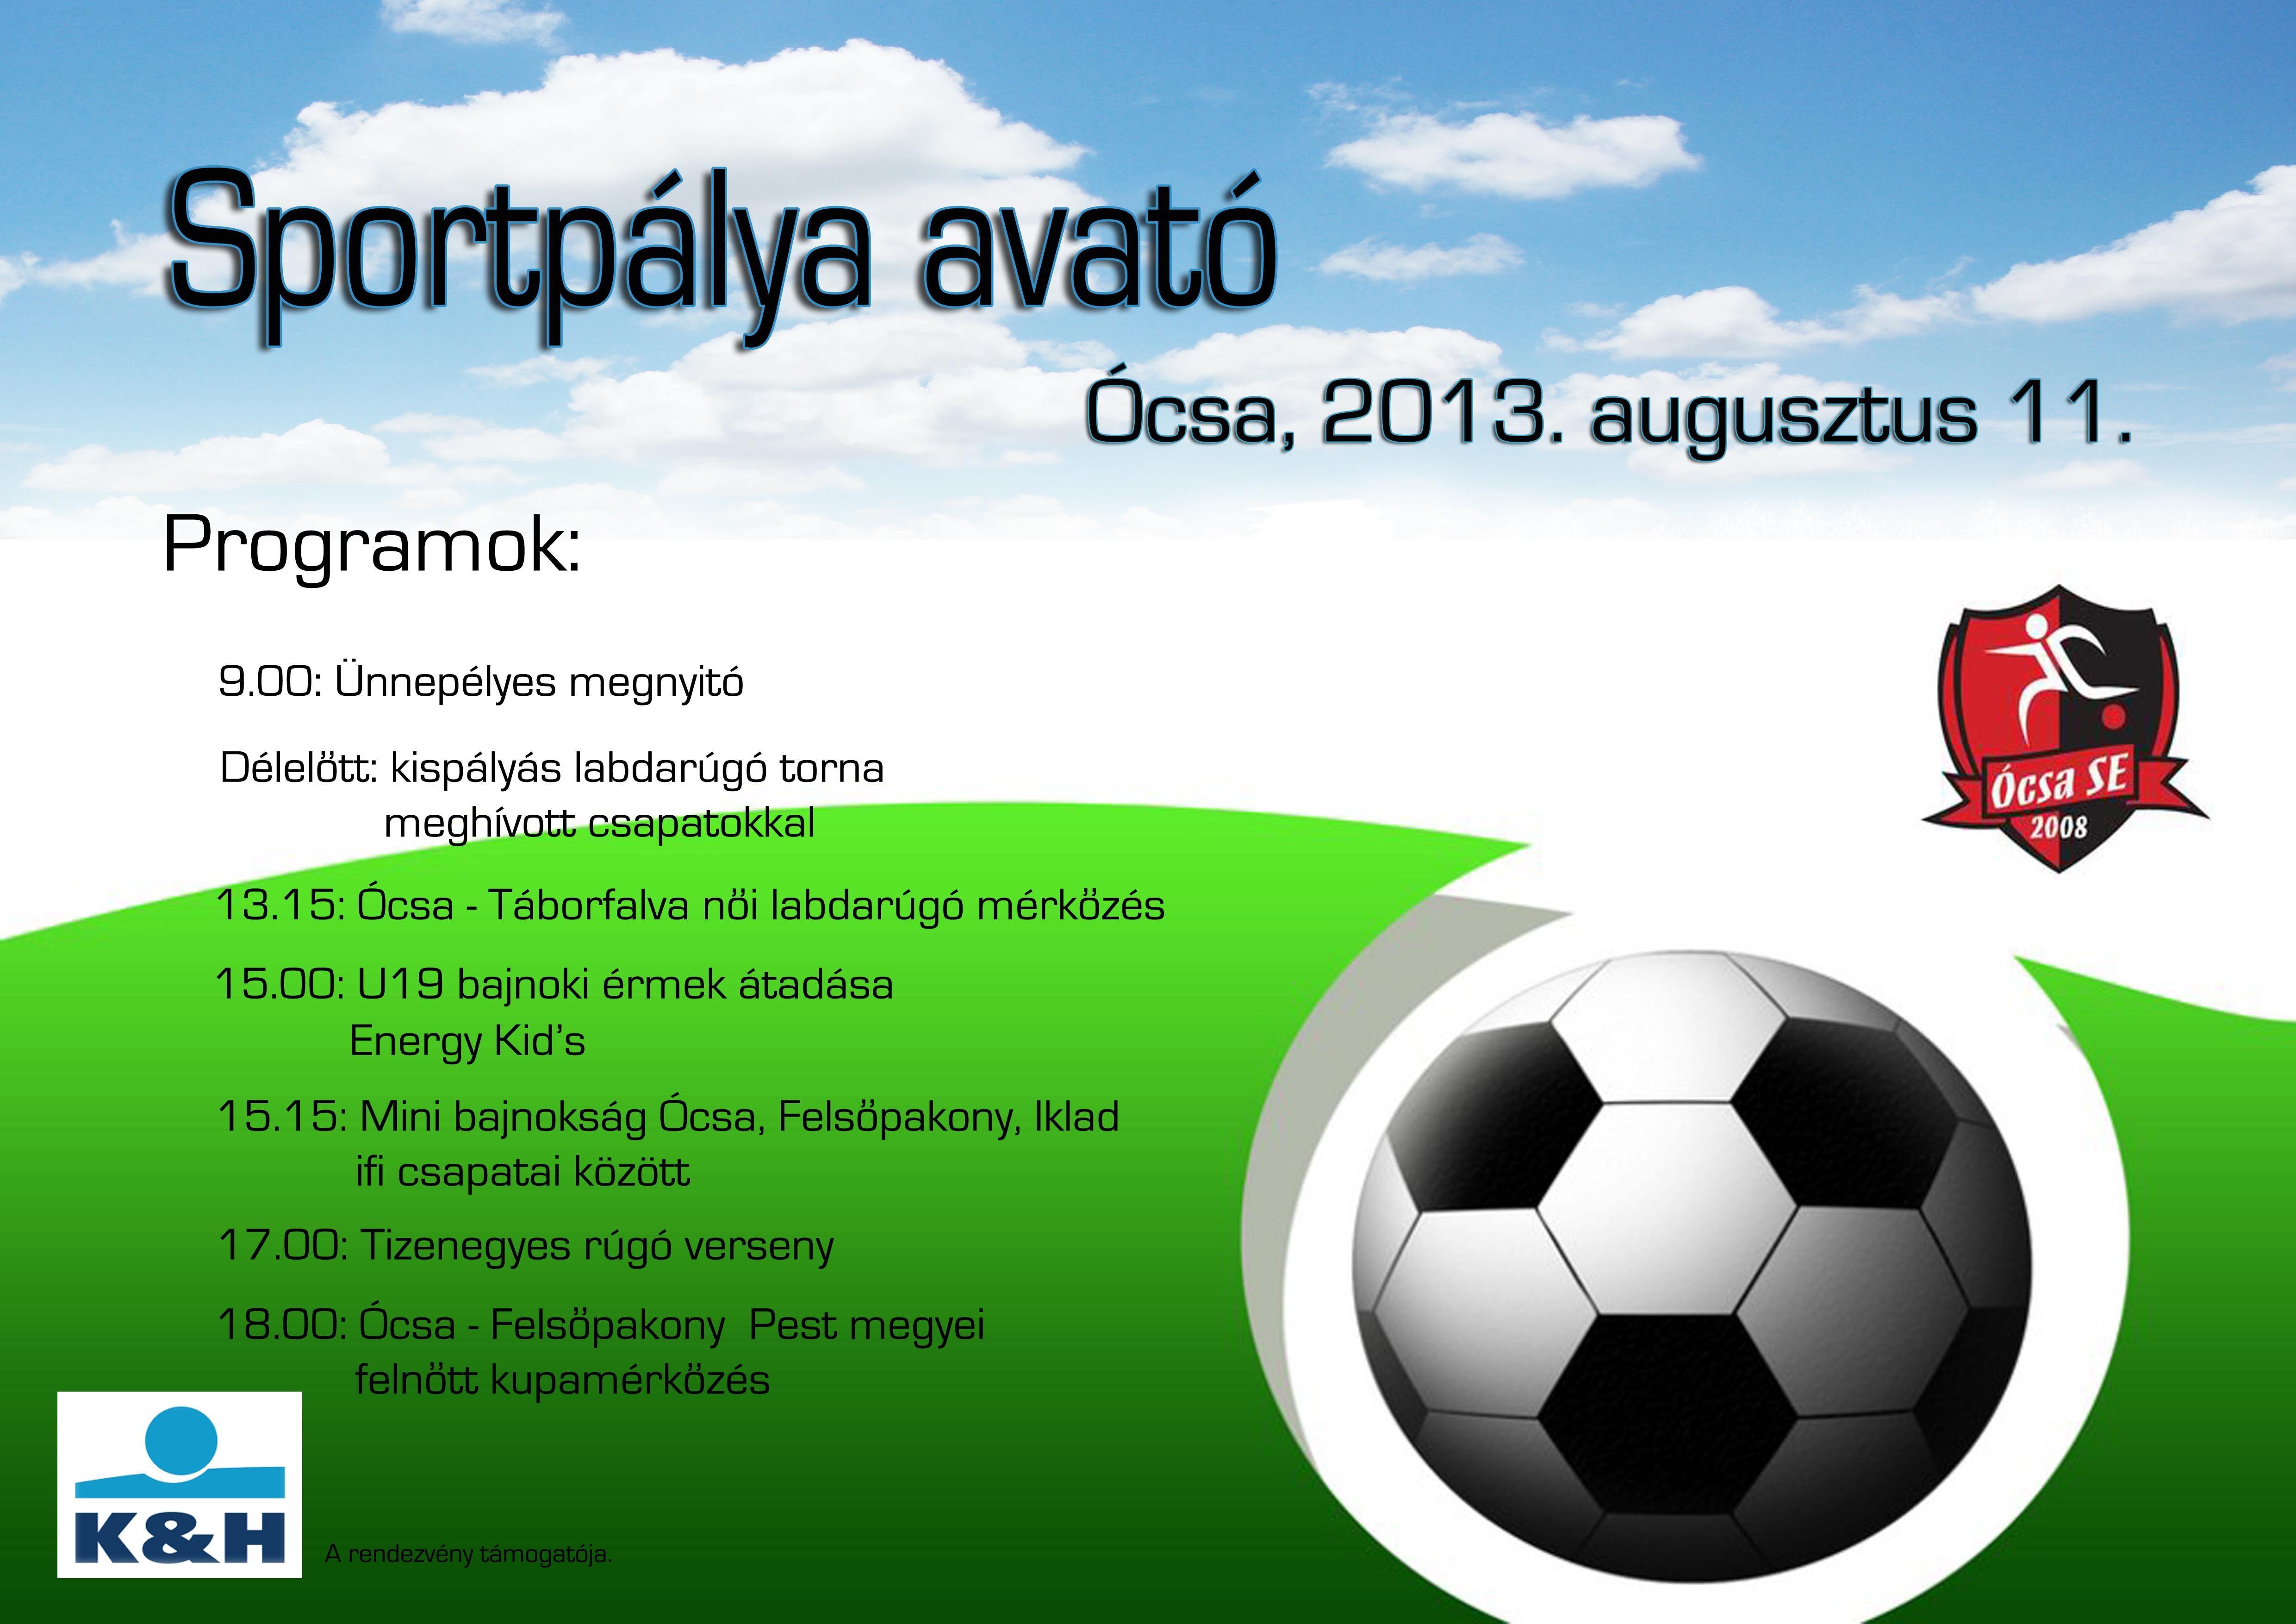 http://www.ocsa.hu/userfiles/image/20130802_sportpalya.jpg